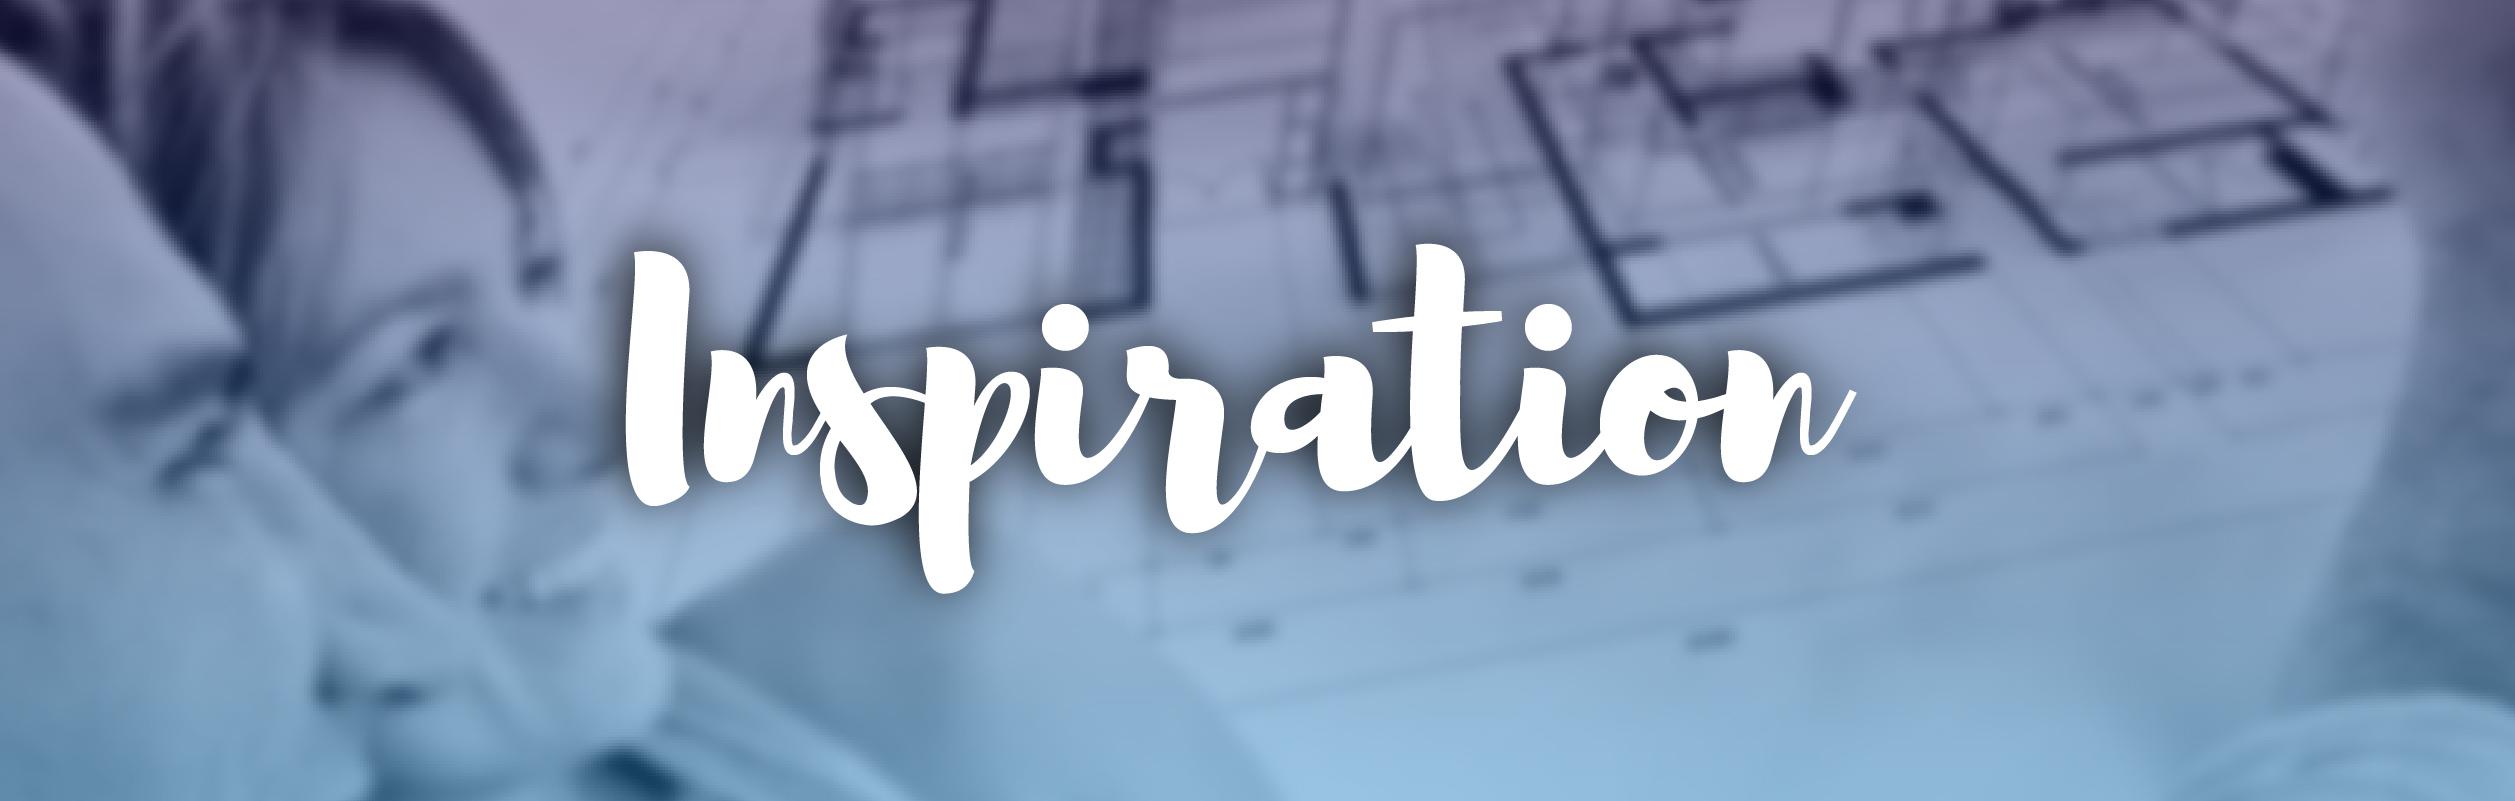 Inspiration-01